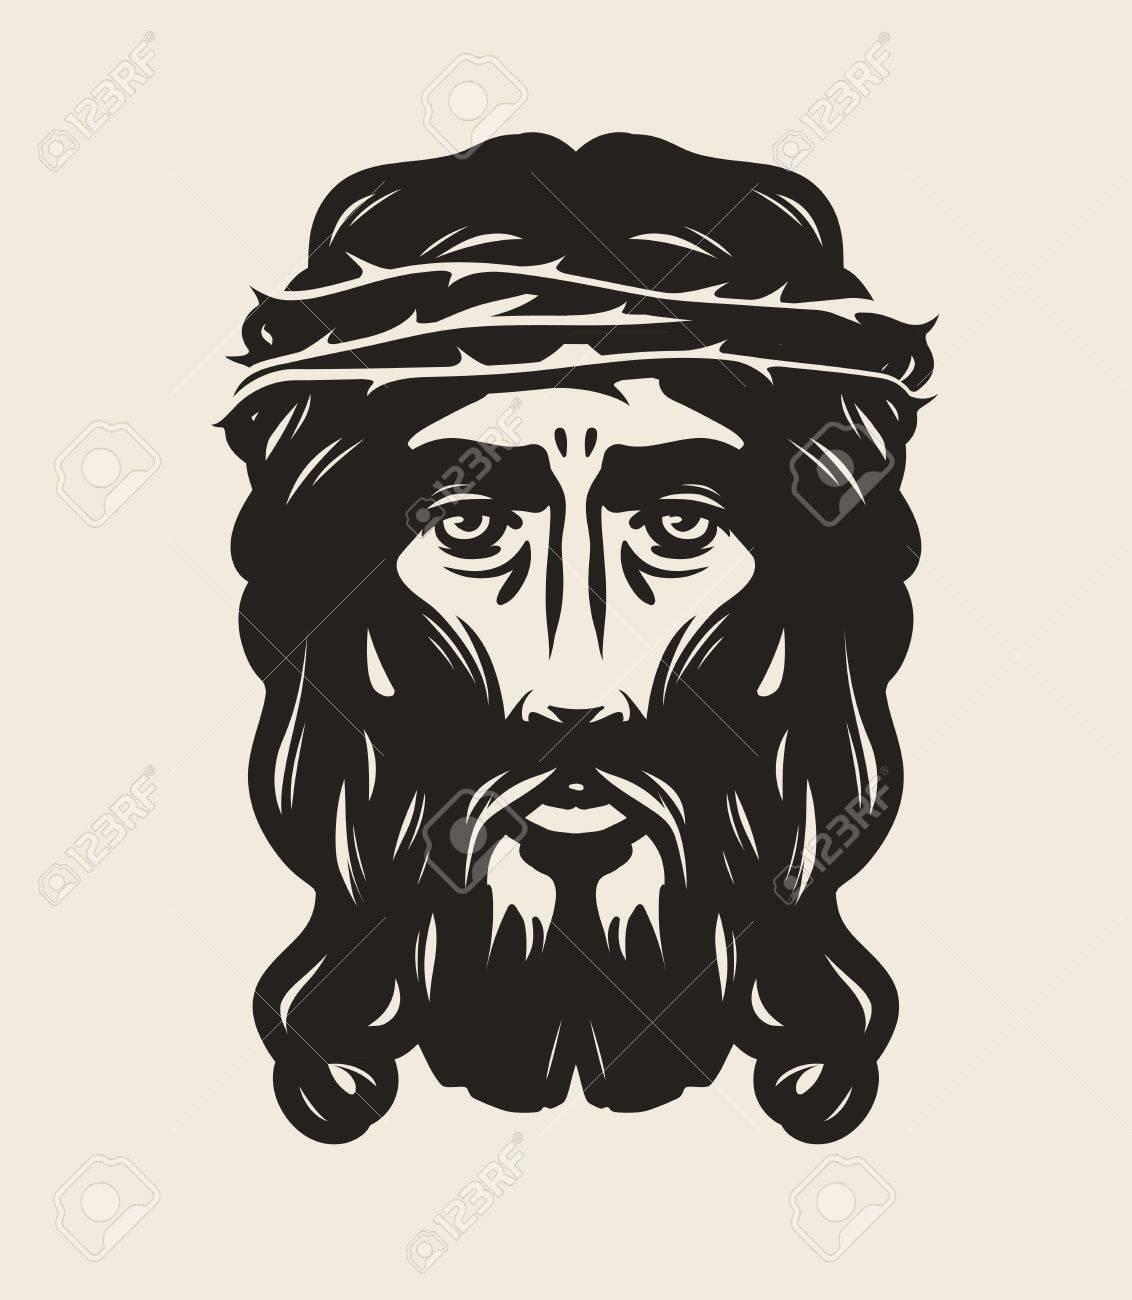 Jesus christ face god religion symbol art vector illustration jesus christ face god religion symbol art vector illustration stock vector 71027653 buycottarizona Image collections